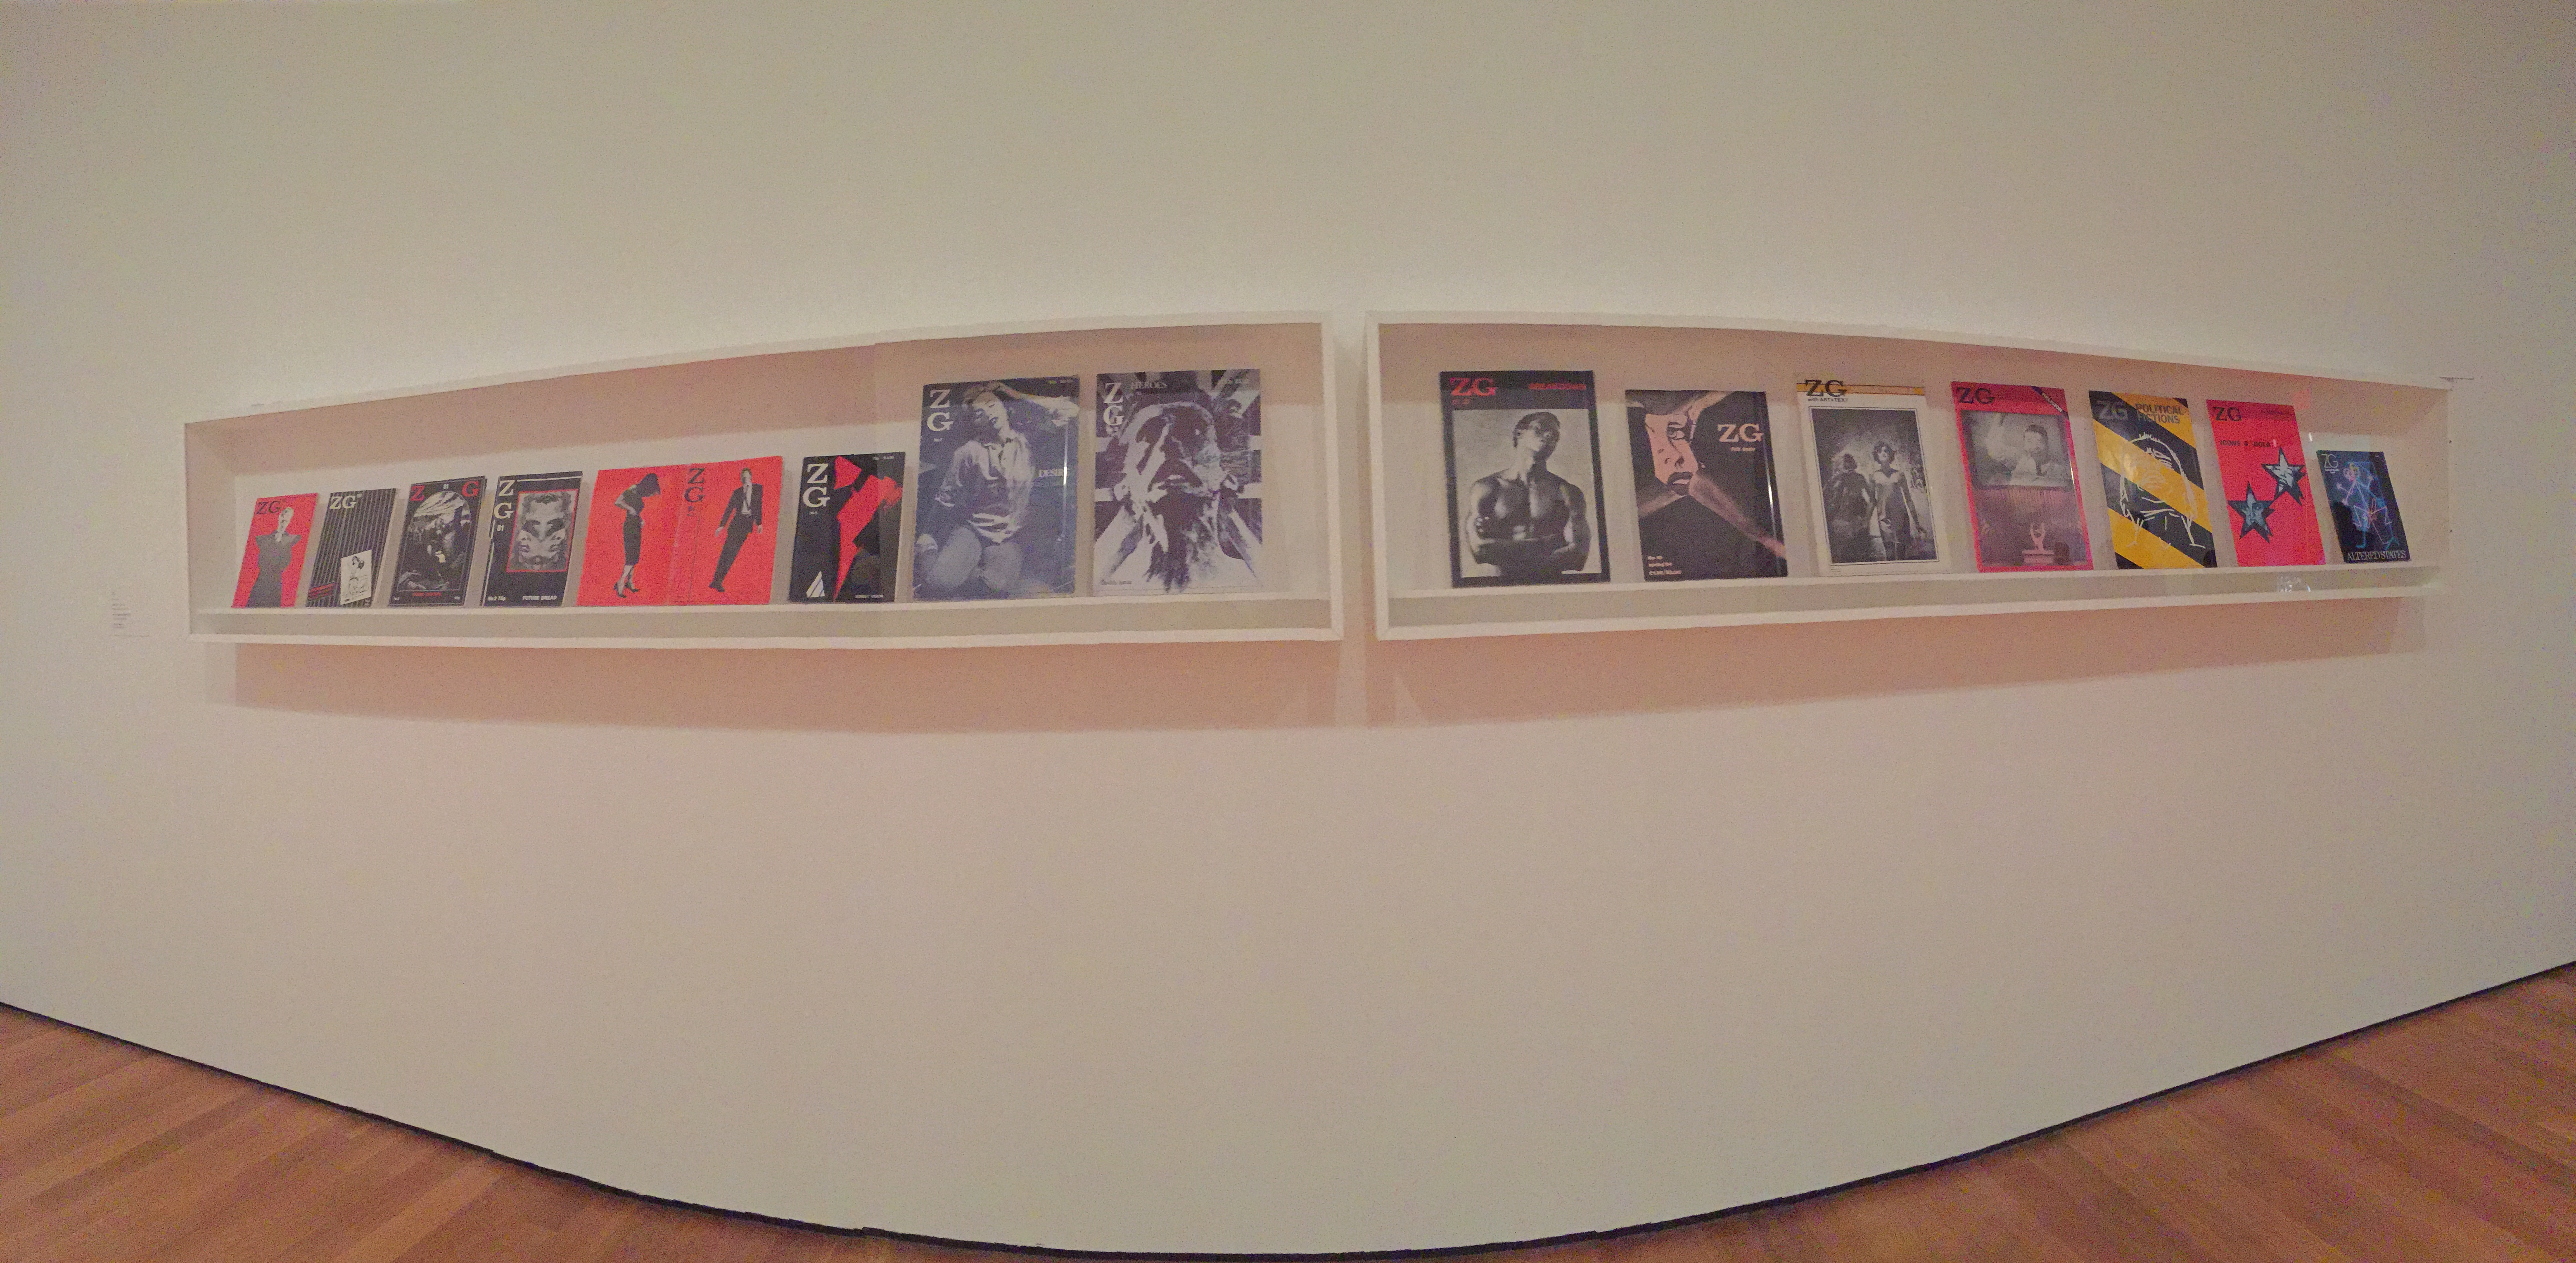 Cut To Swipe at MoMA